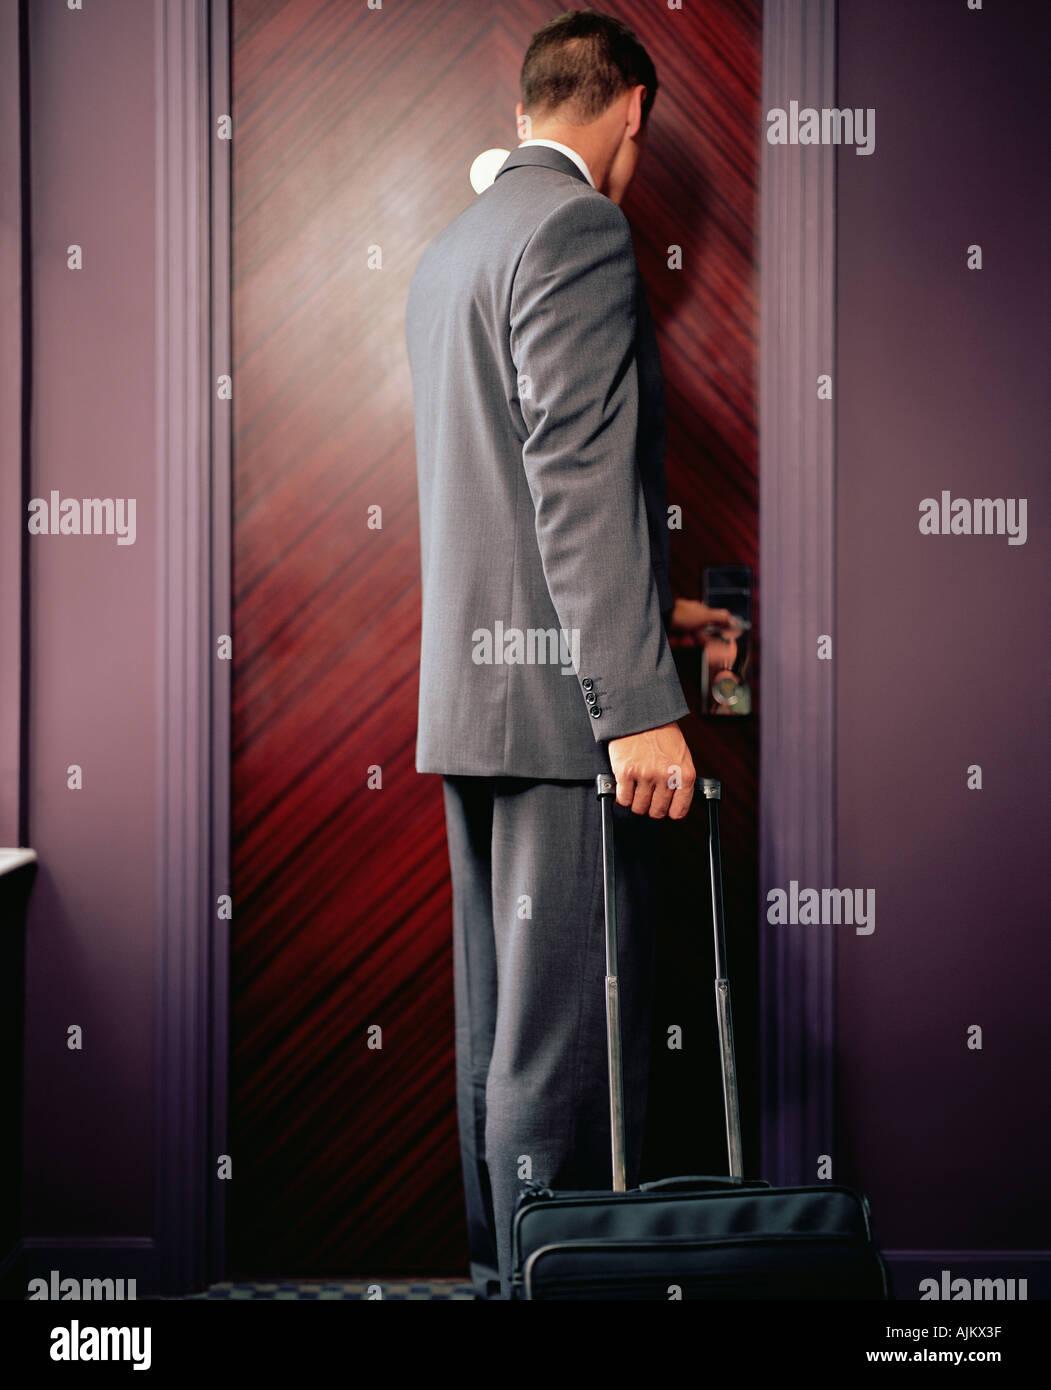 Man opening hotel room door Stock Photo, Royalty Free